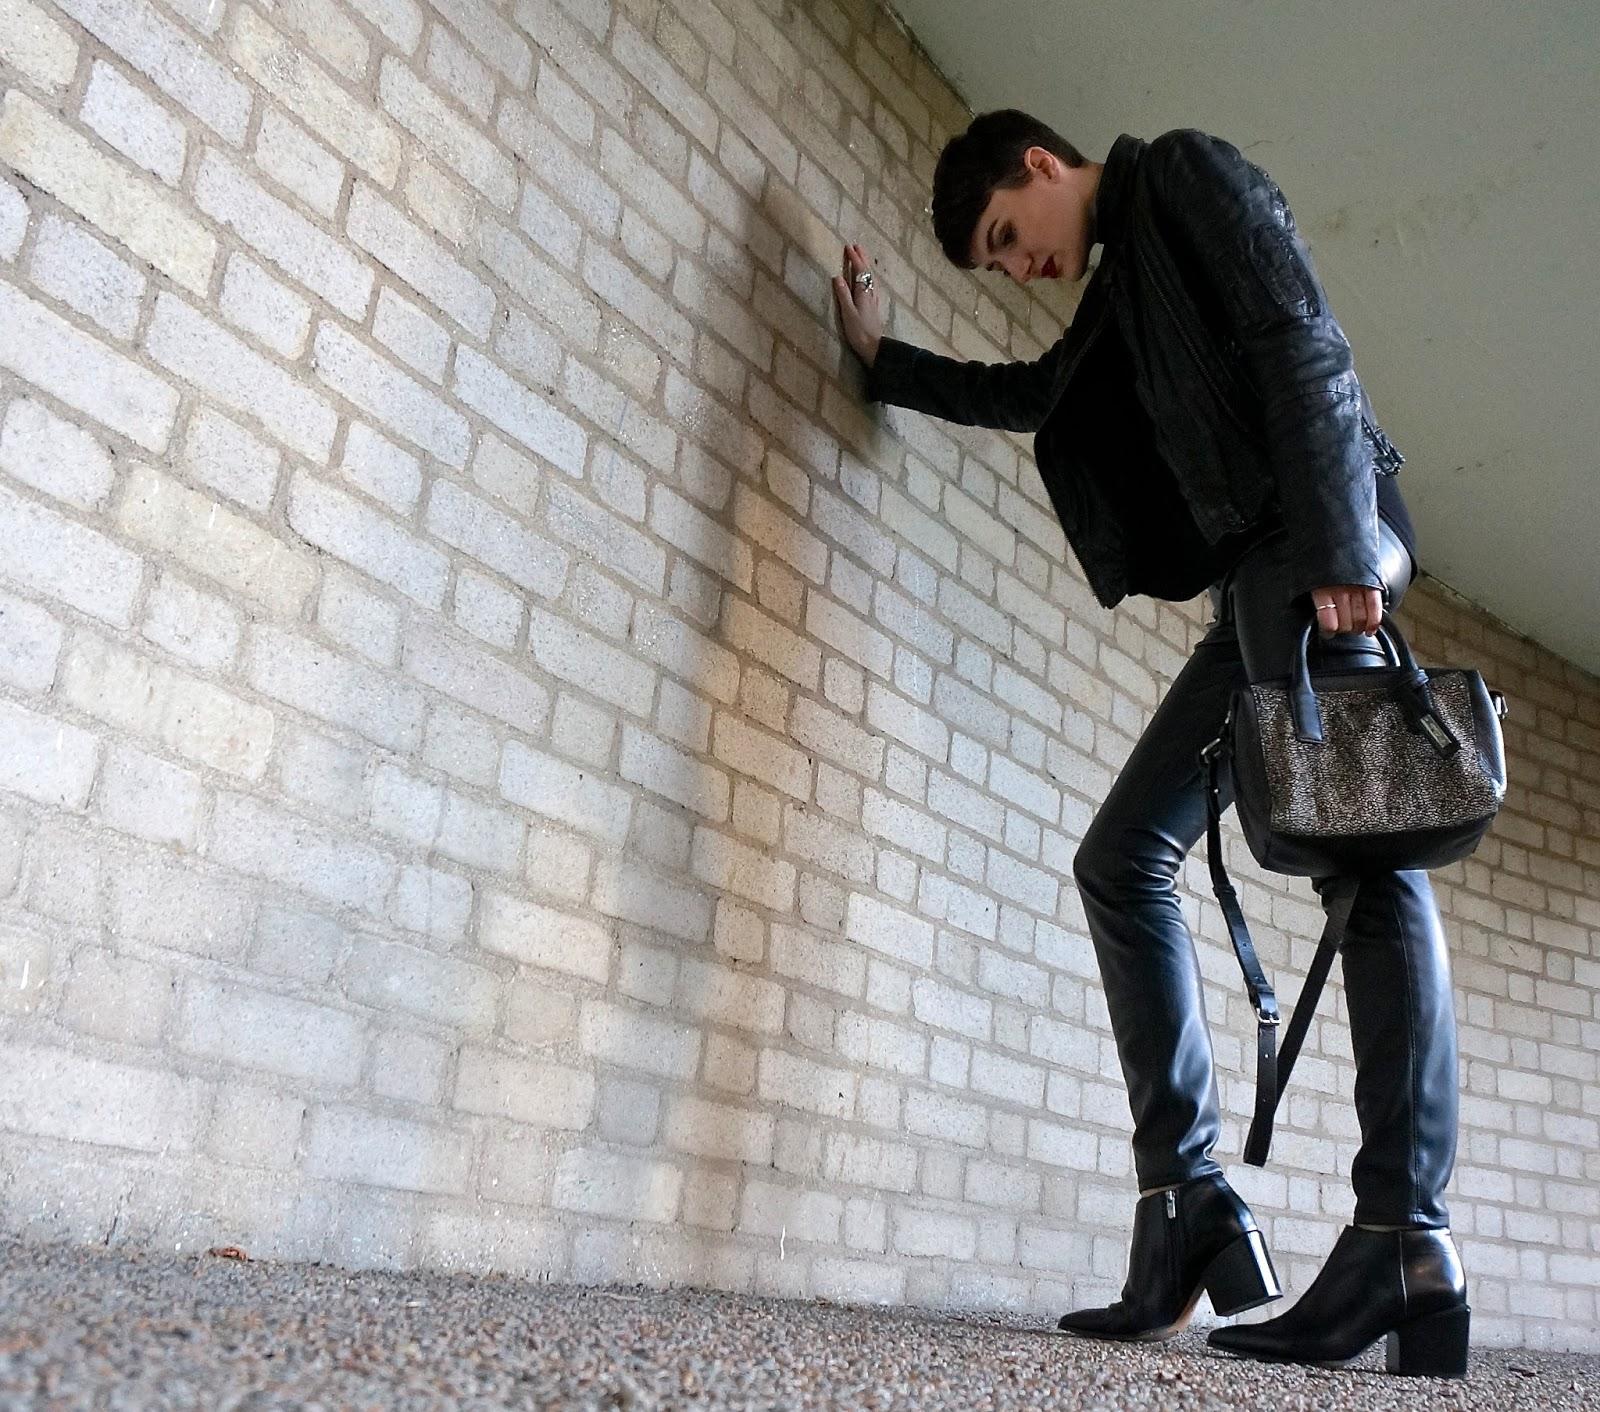 1 Piece 10 Styles Clarks leather outfit All Saints Zara Lexie Blush 1P10S www.lexieblush.co.uk